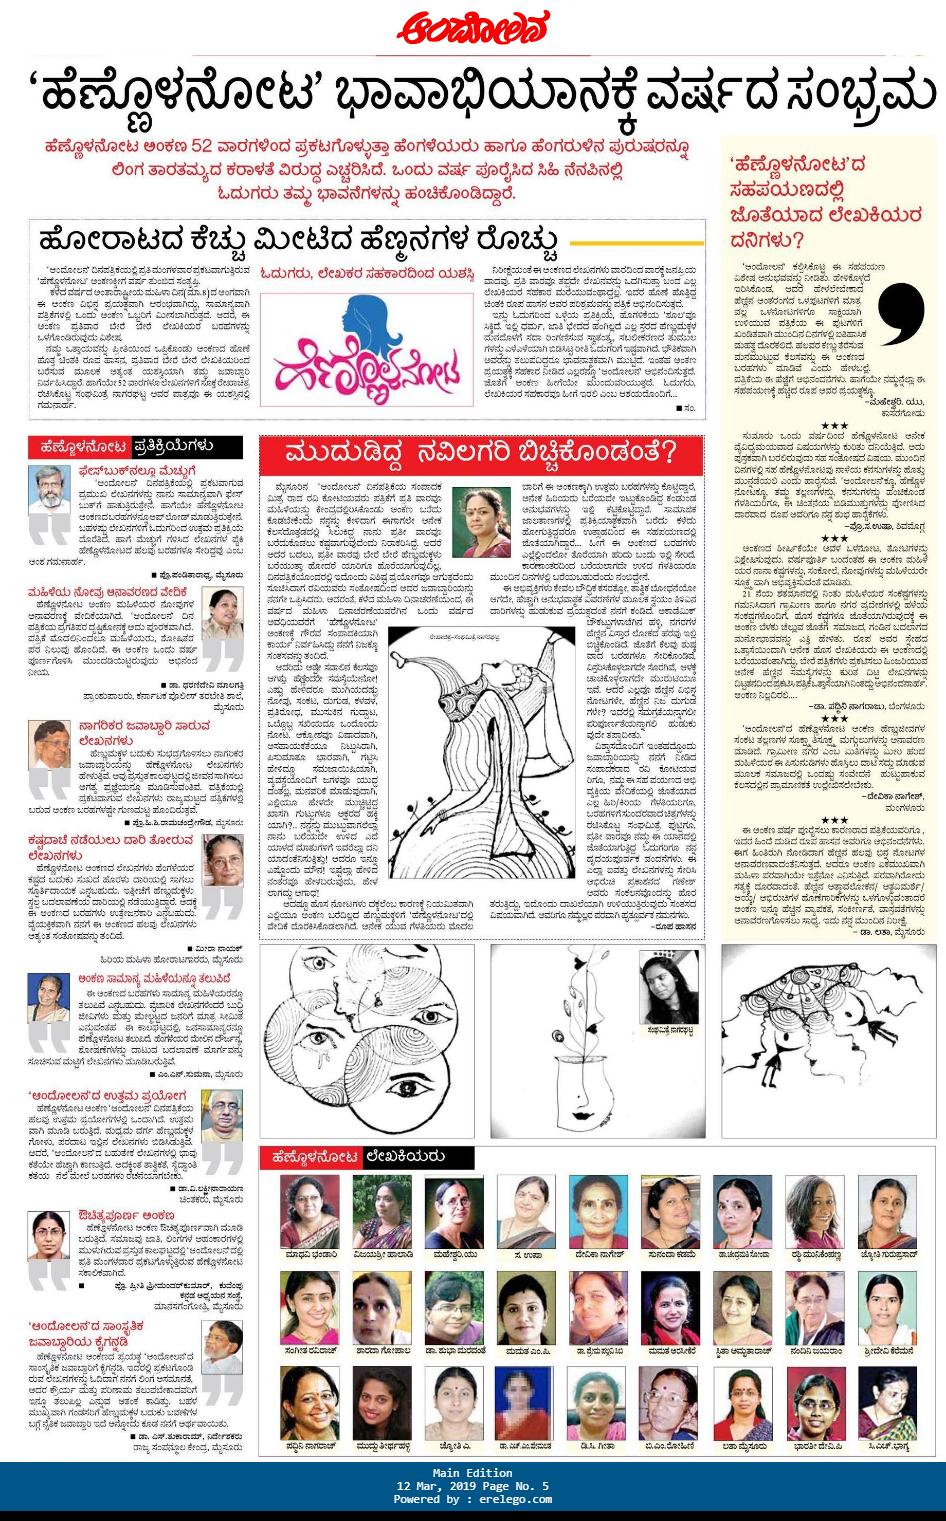 Hennolanota a feminist column edited by Rupa Hassan for Andolana Mysore